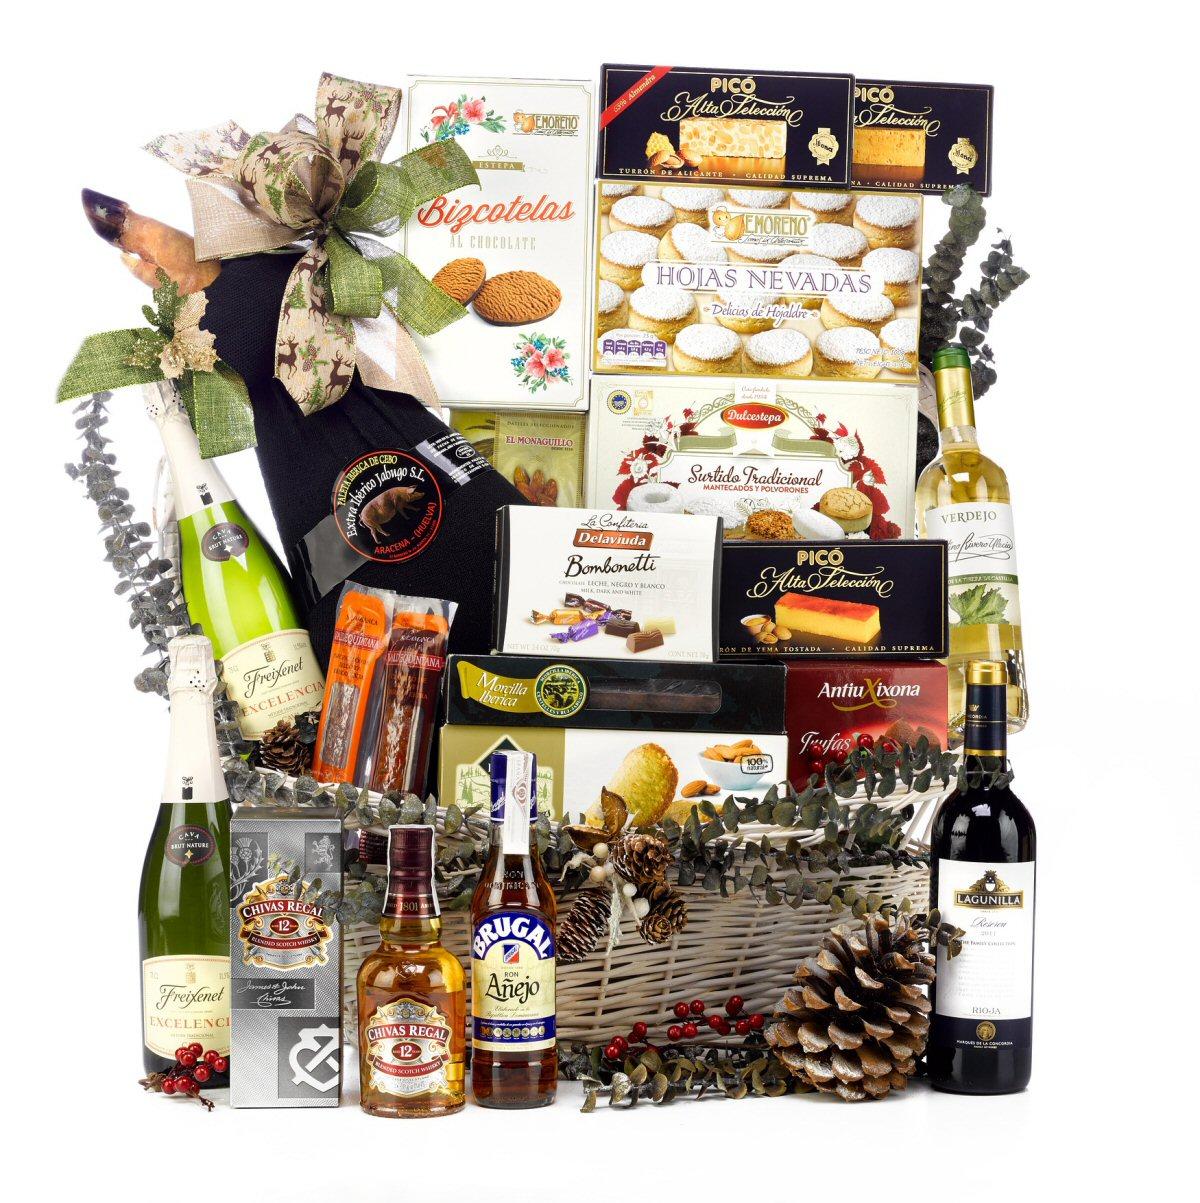 Easy Christmas Gift Shopping The Edible Edition - Christmas Hampers